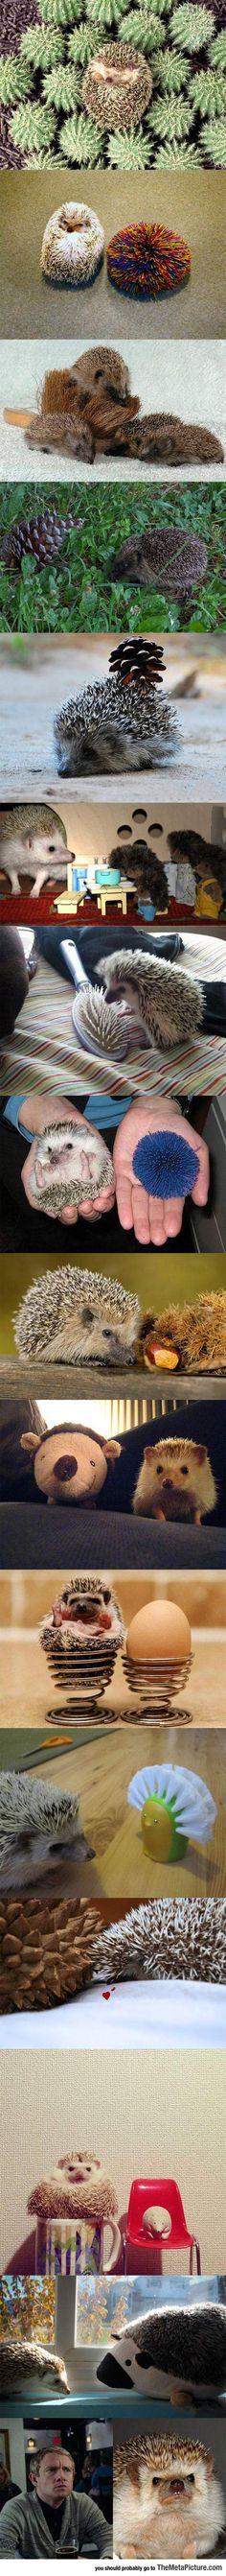 Hedgehogs Next To Things That Look Like Hedgehogs